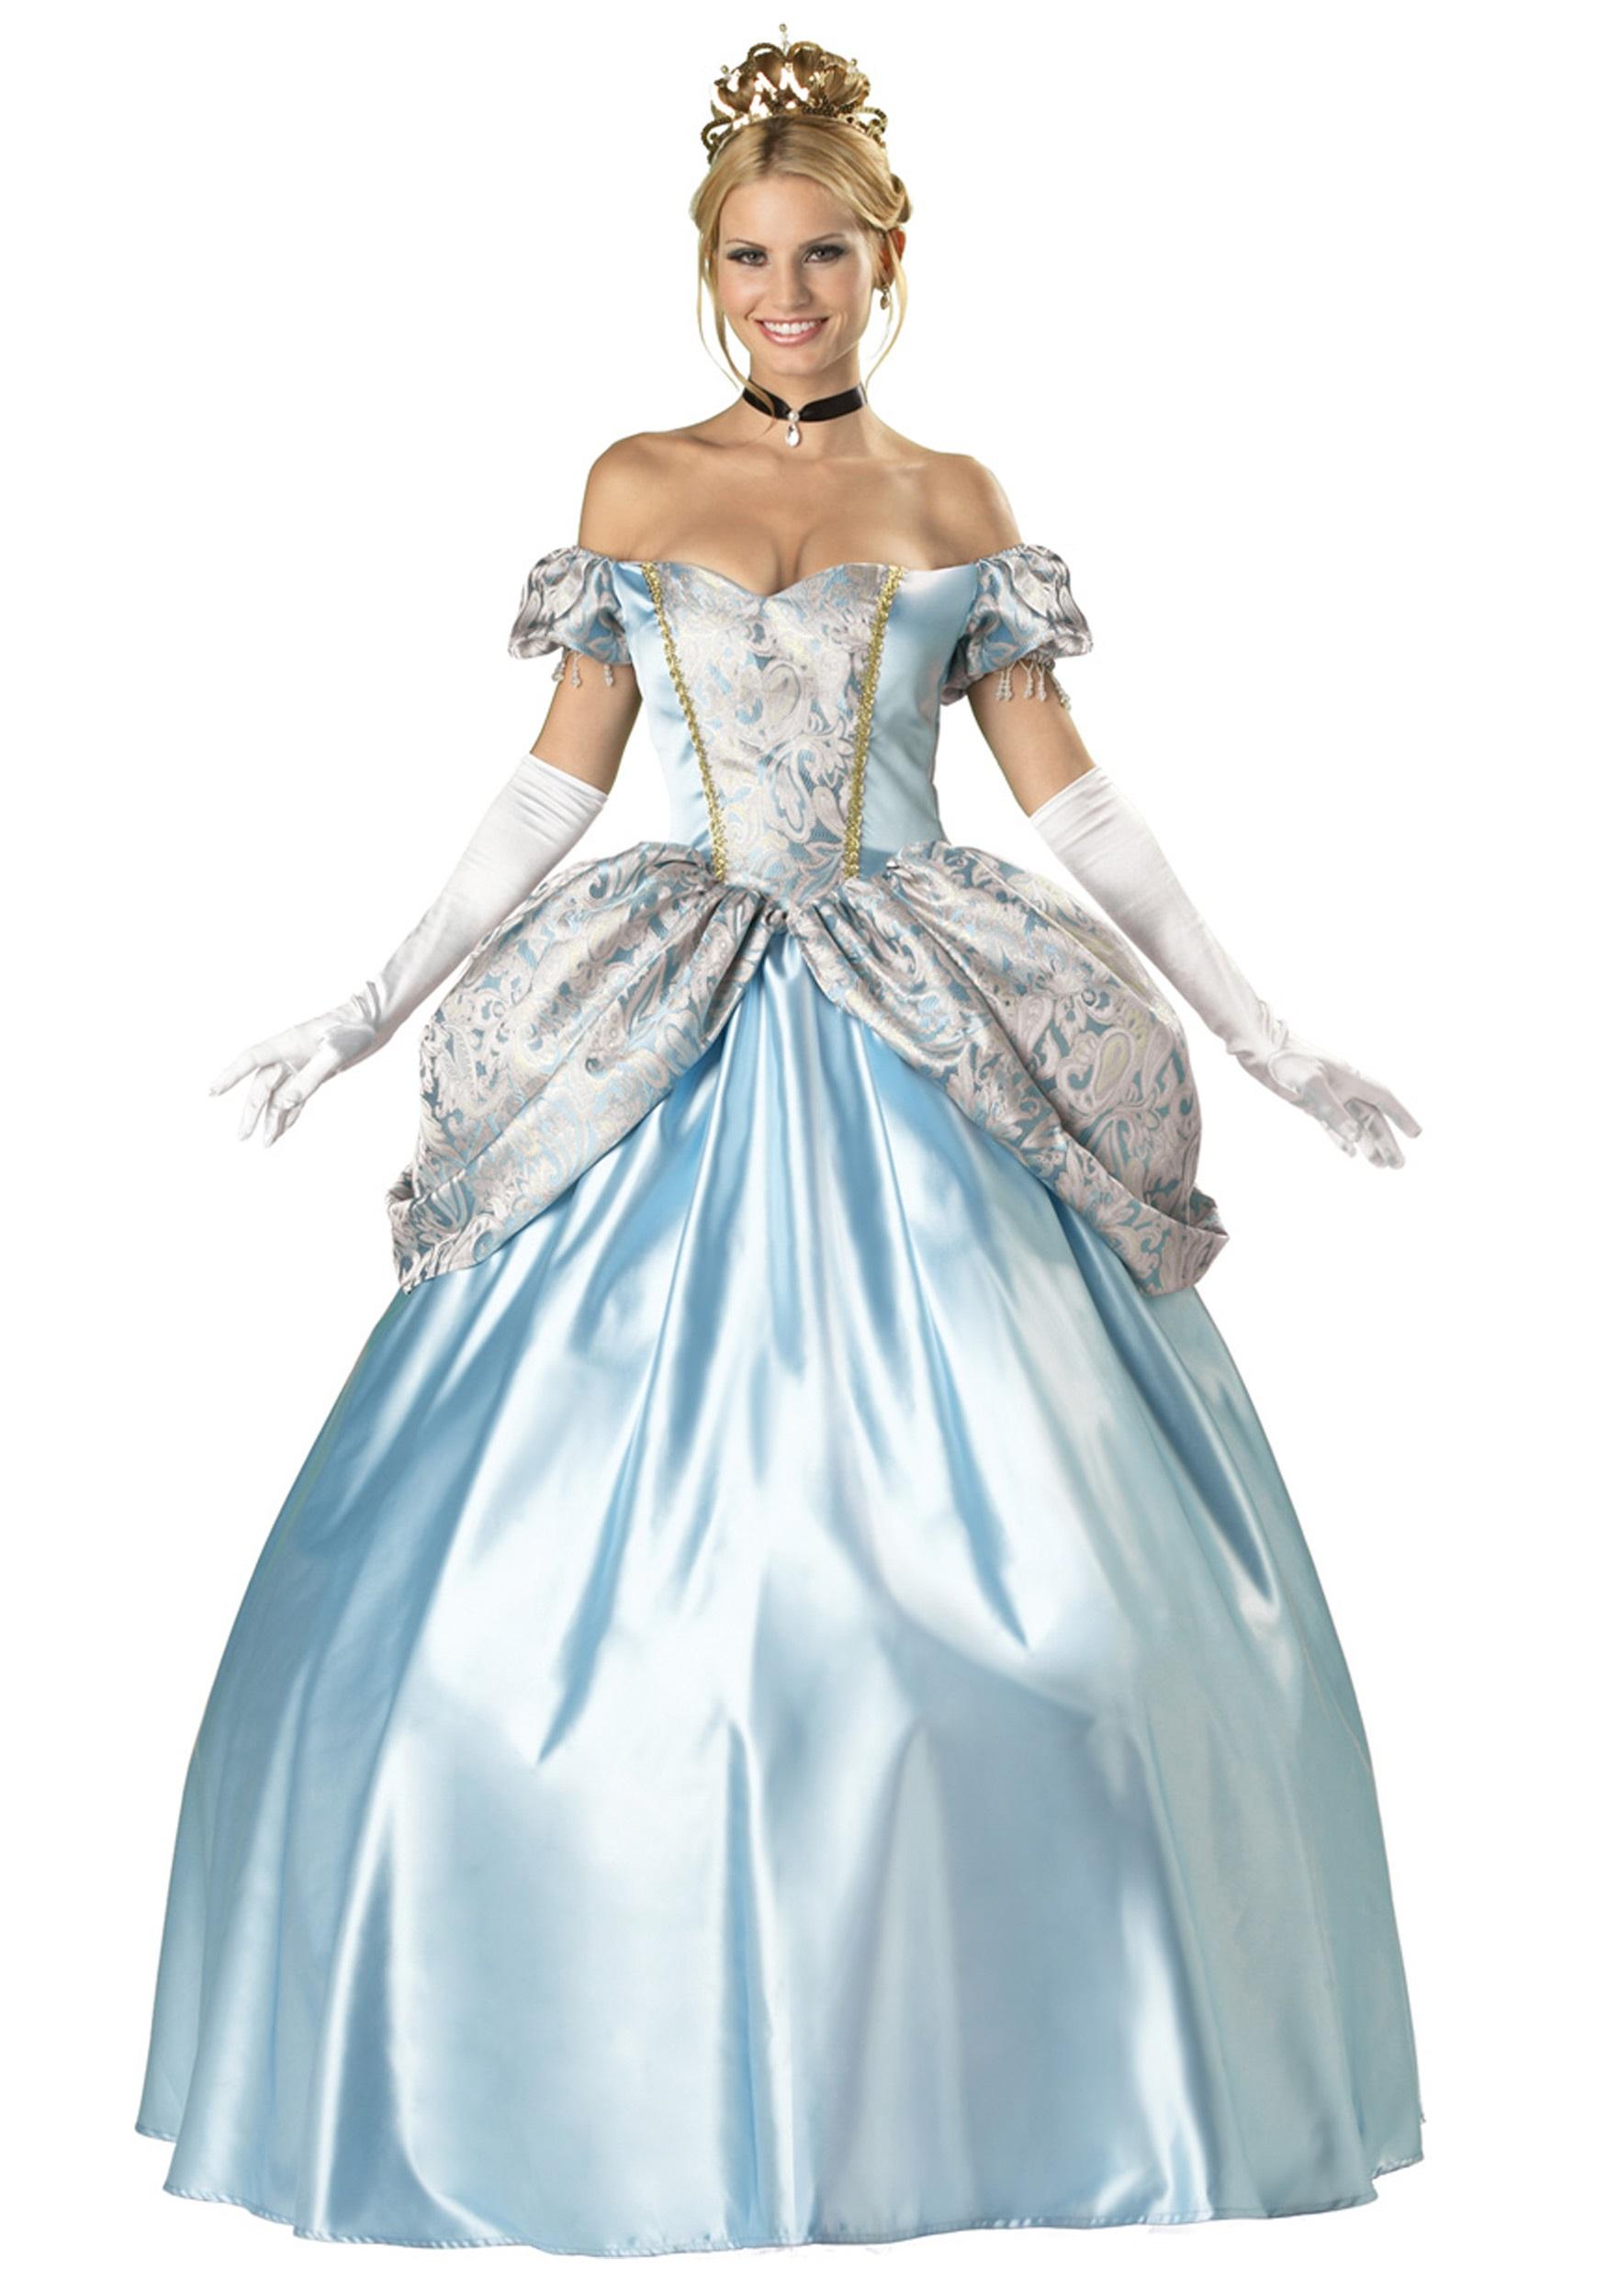 Elite Enchanting Princess Costume - Halloween Costumes